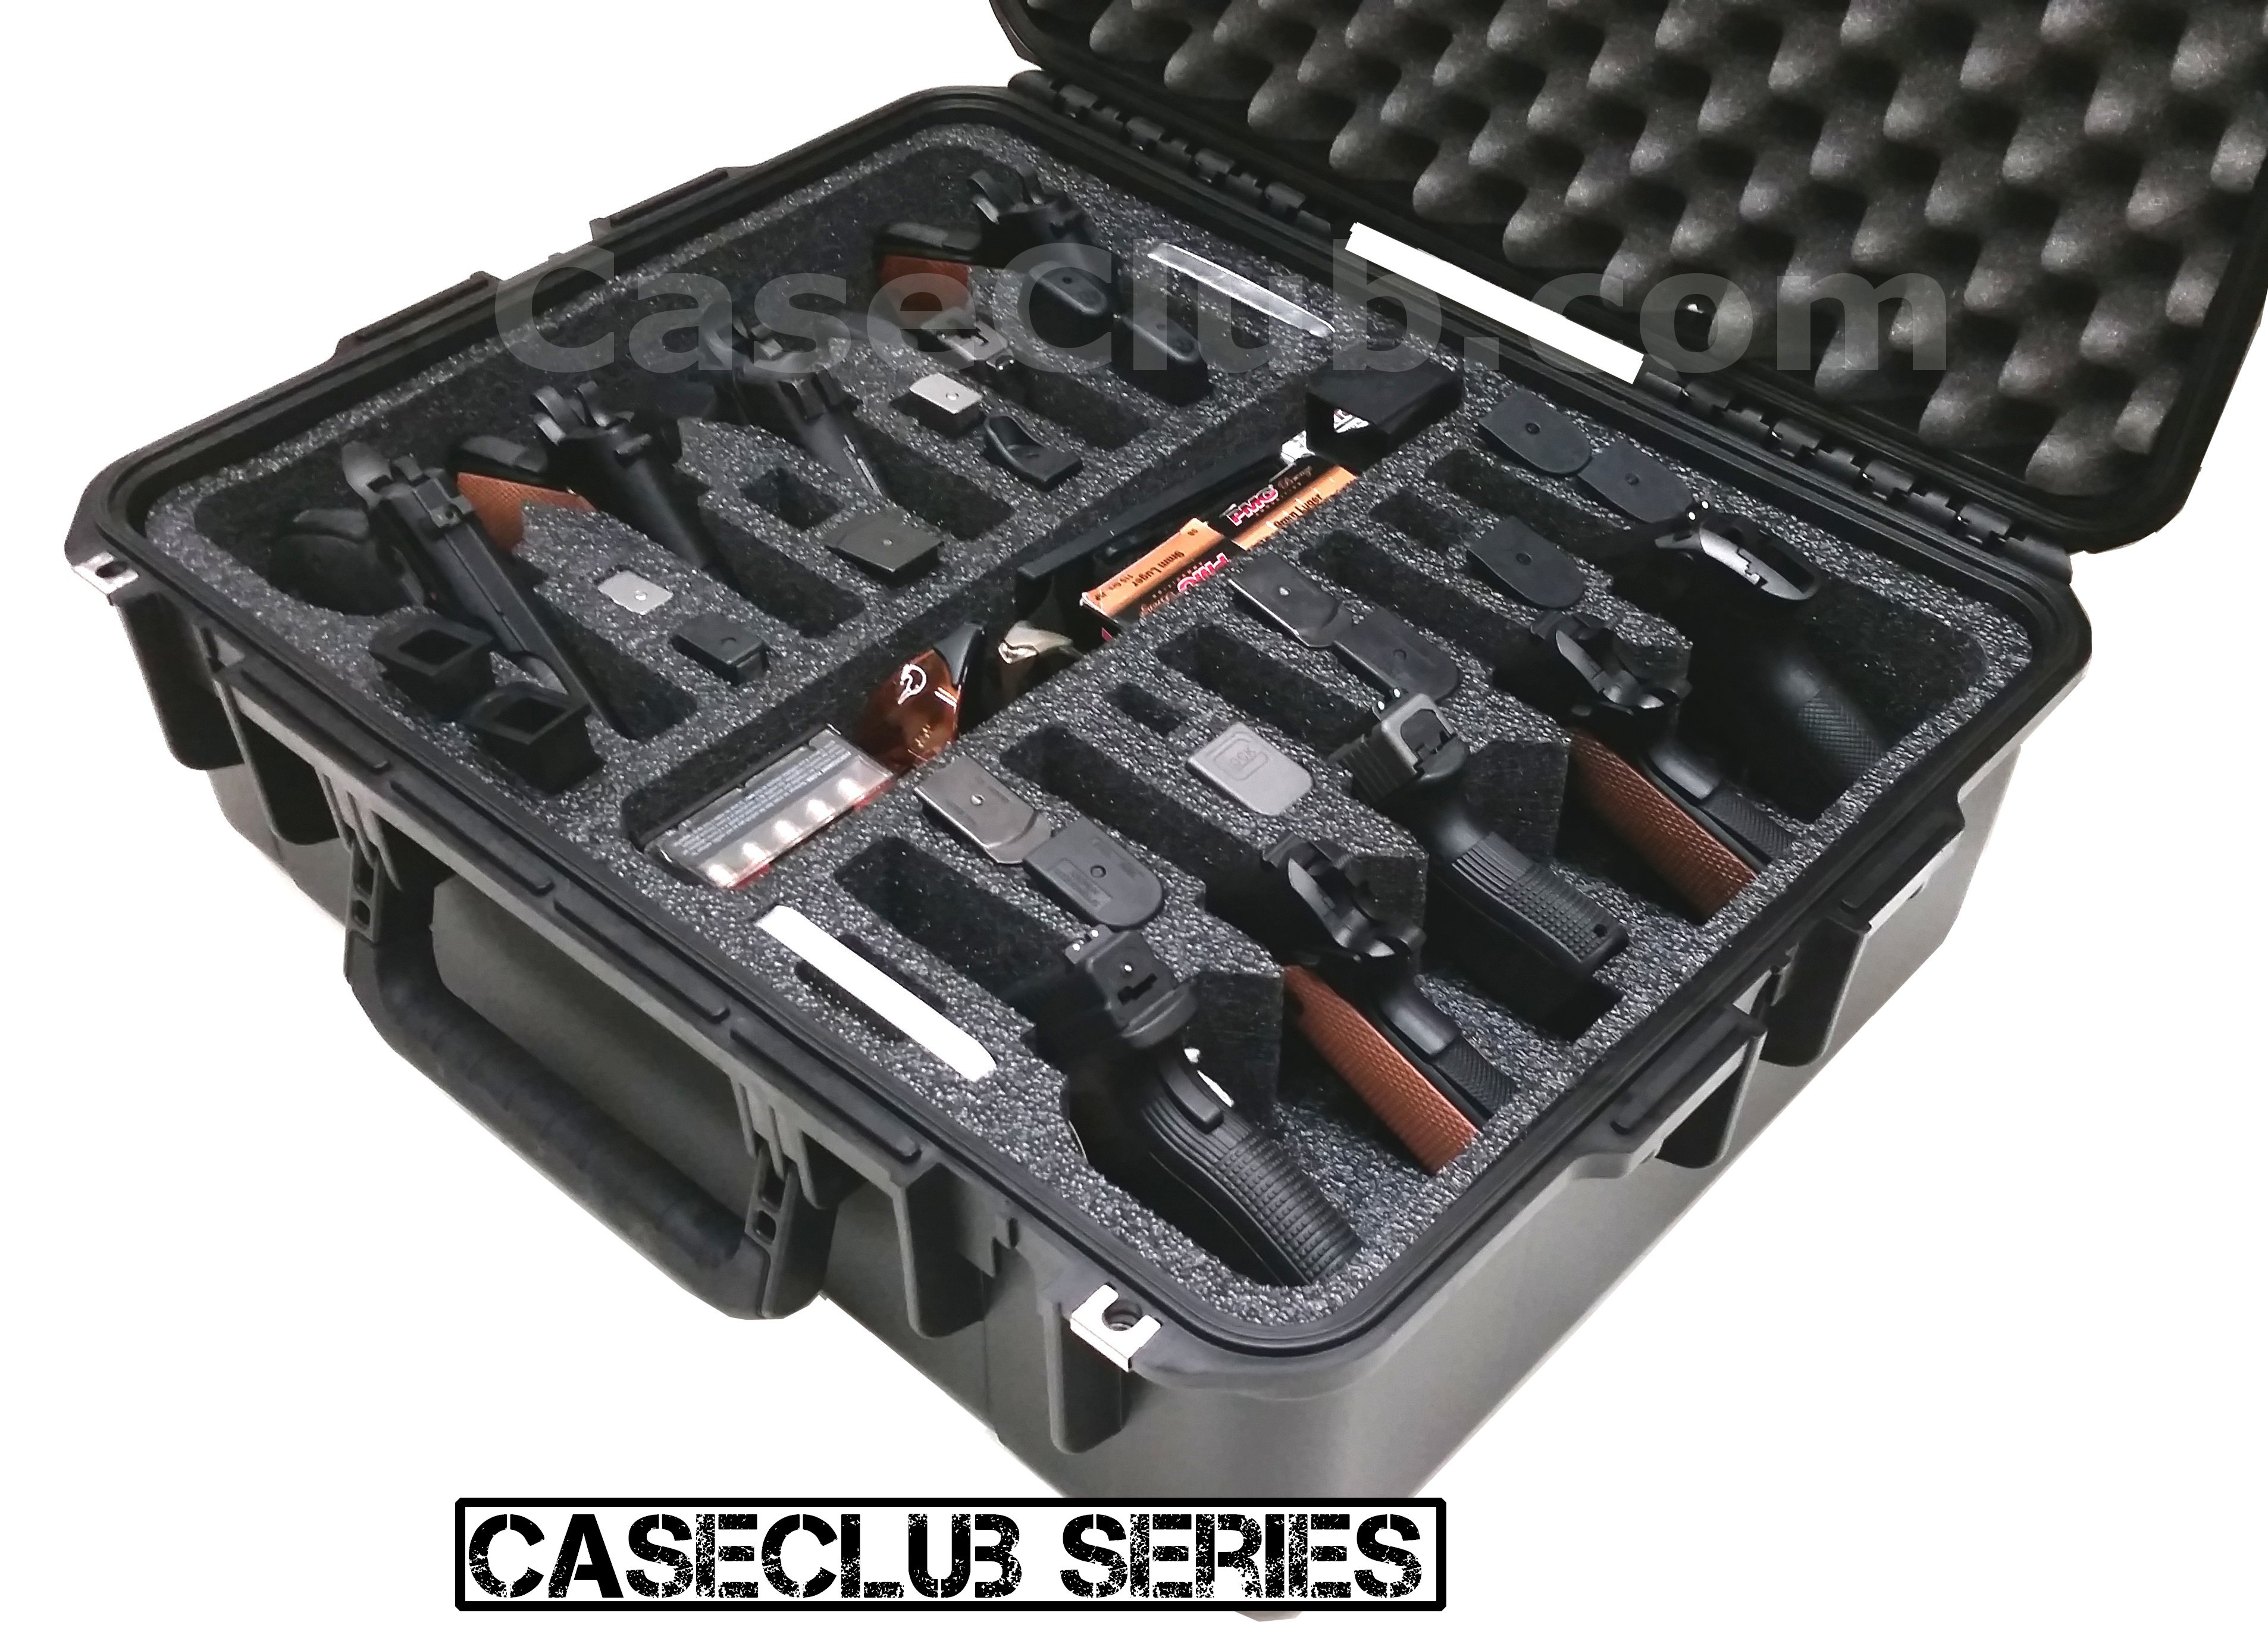 Case Club Waterproof 10 Pistol Case With Silica Gel